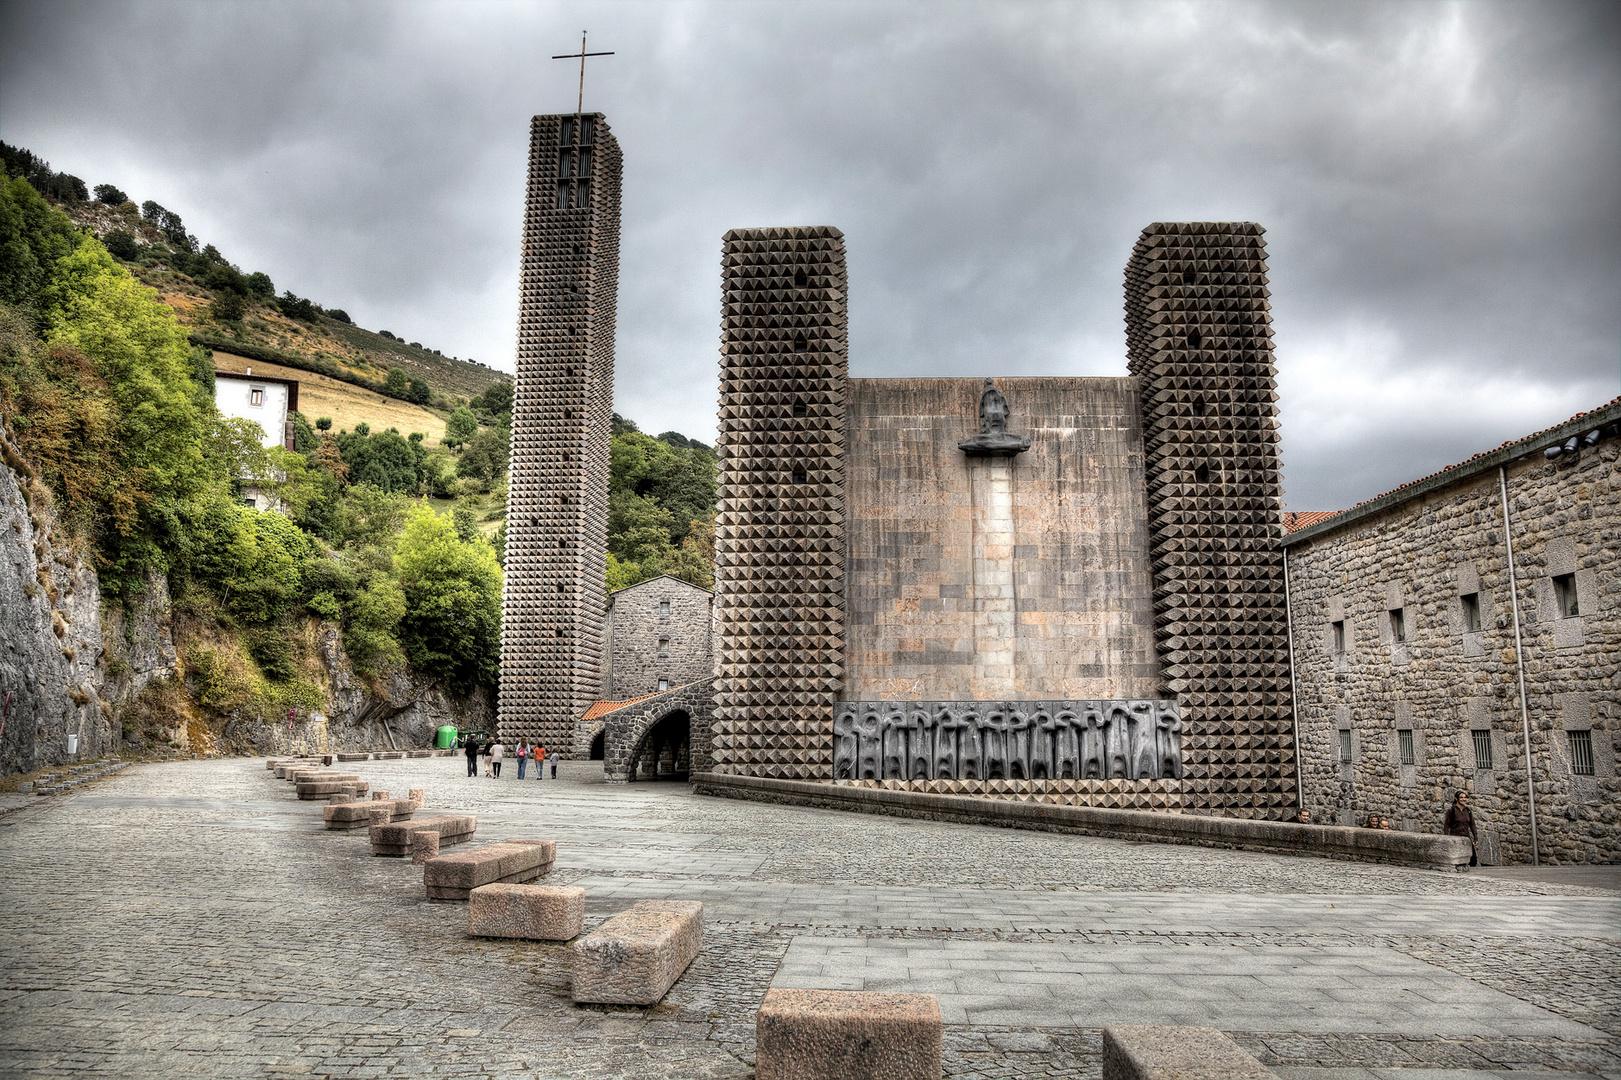 Santuario de Aránzazu